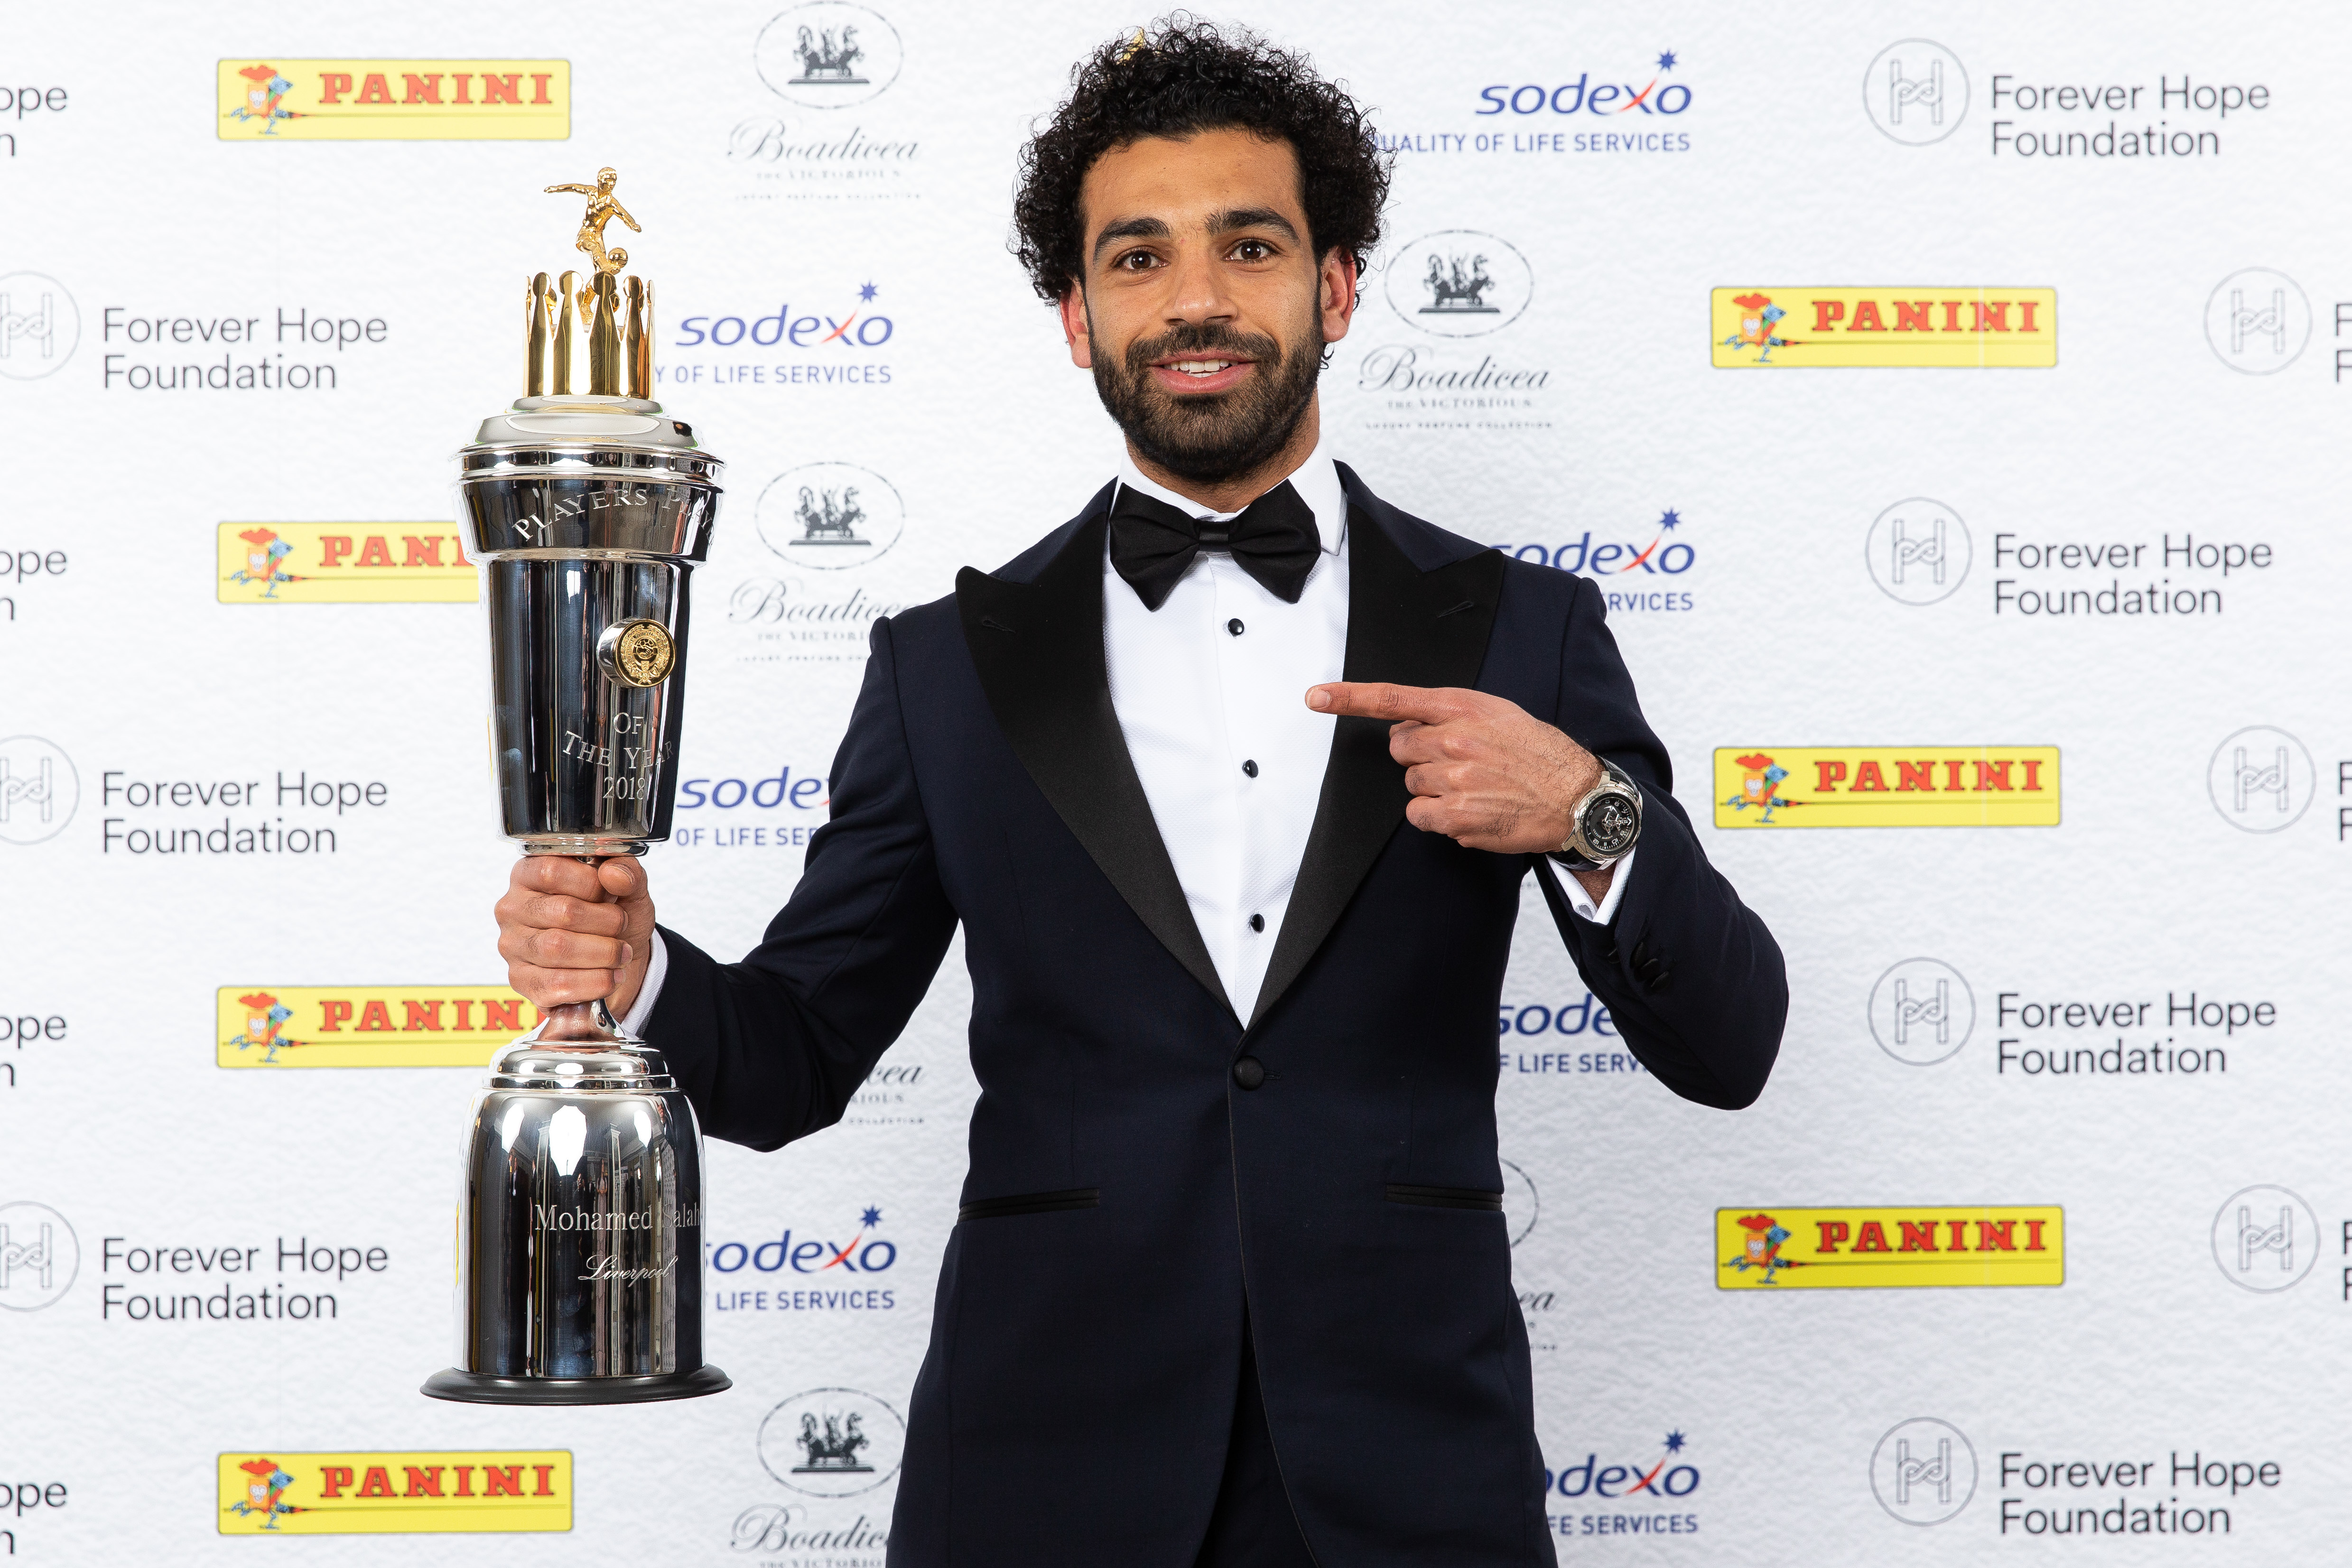 Salah won last season's Player of the Year award. Image: PA Images